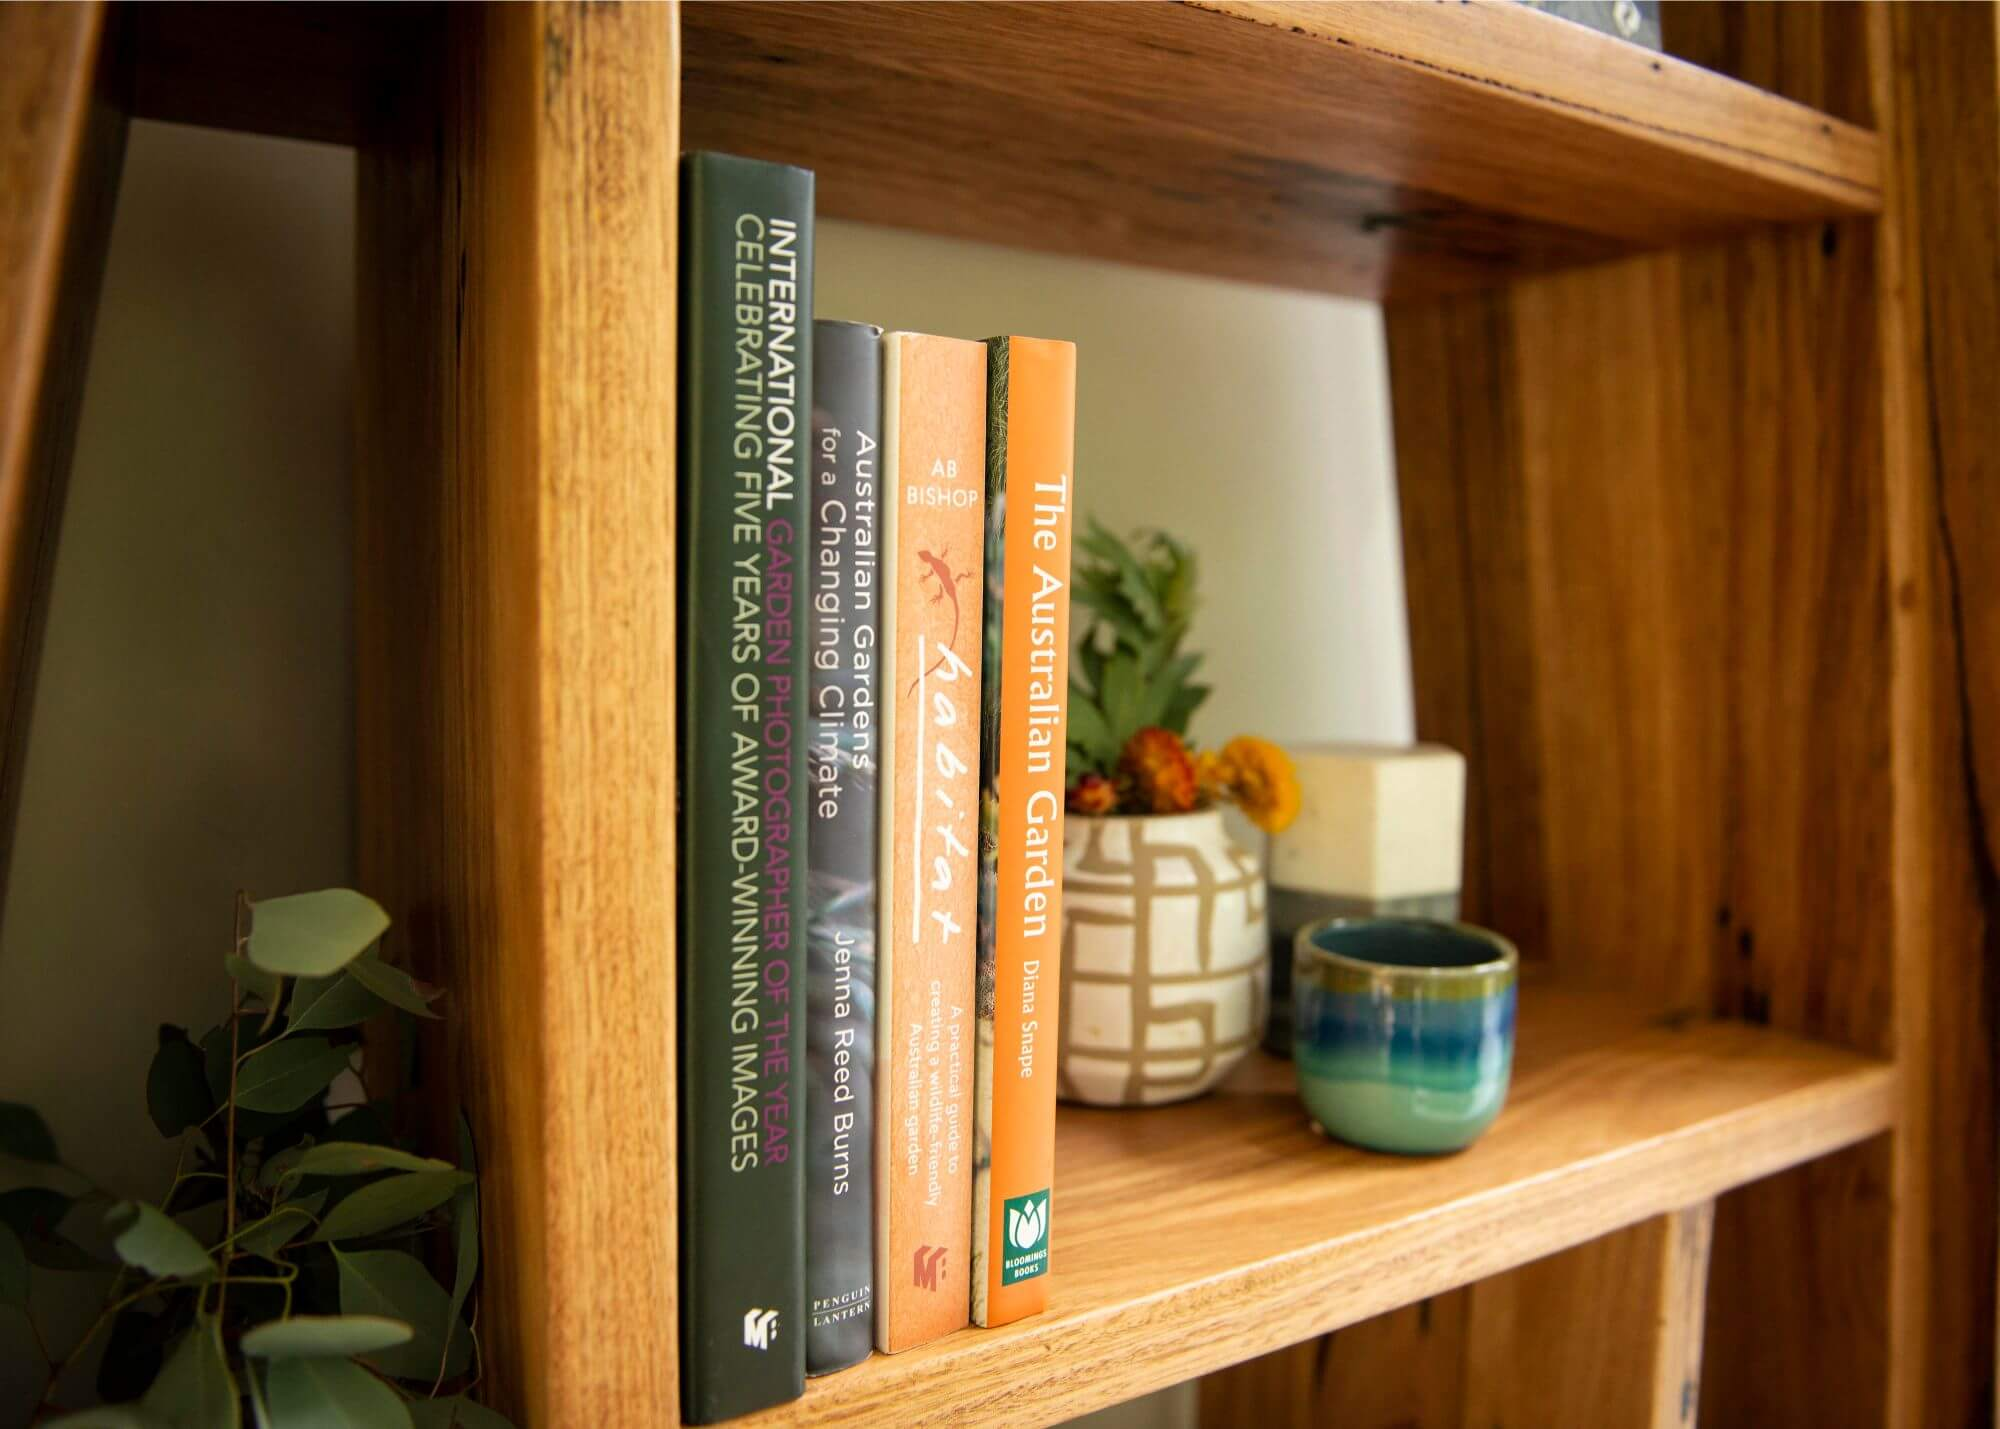 Bookshelf vignette - Melbourne Interior Styling - Leeder Interiors